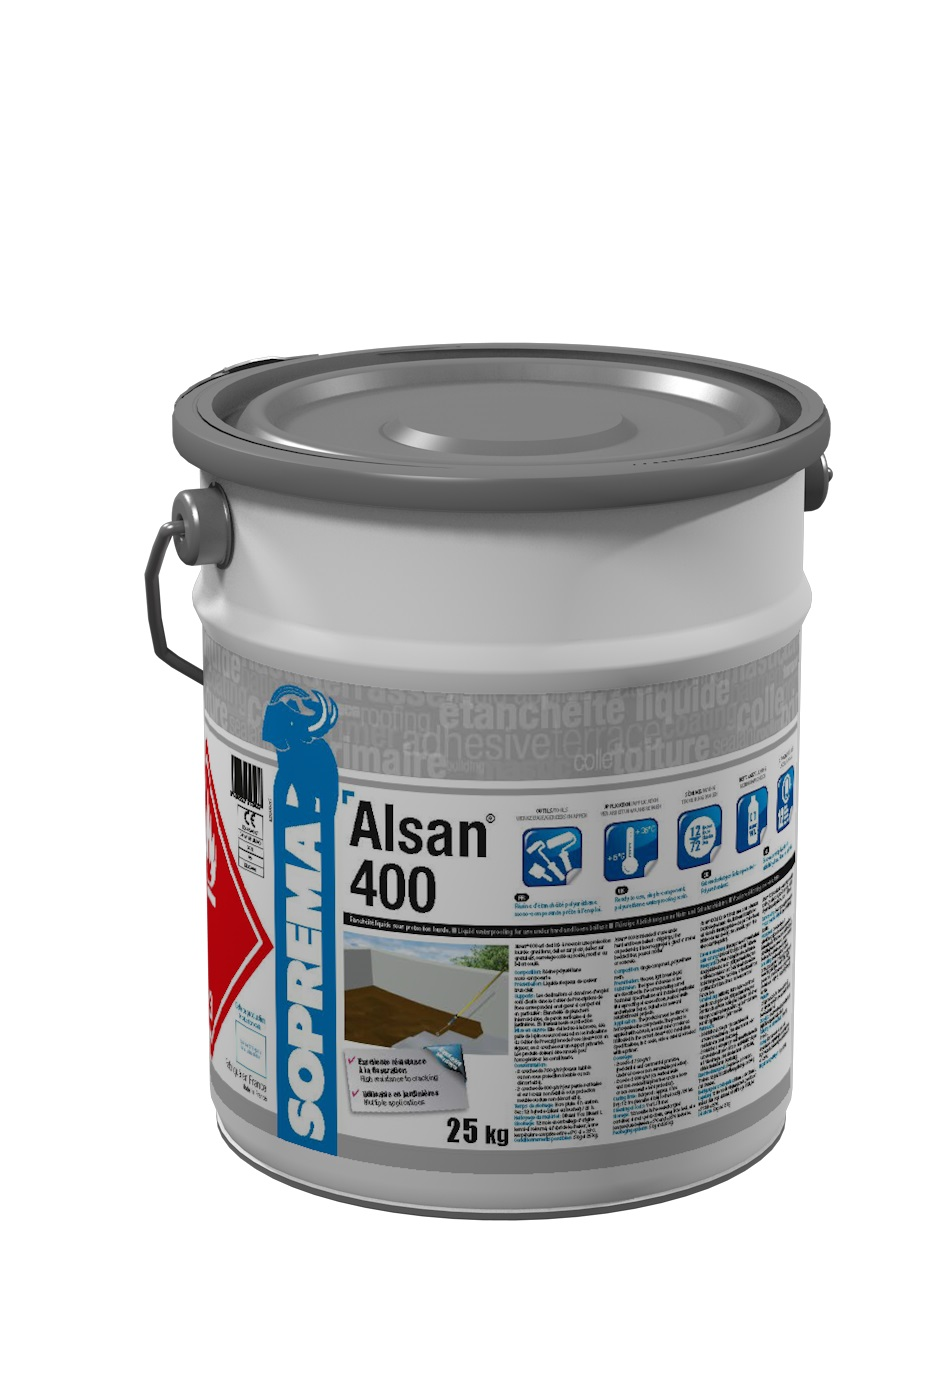 ALSAN 400